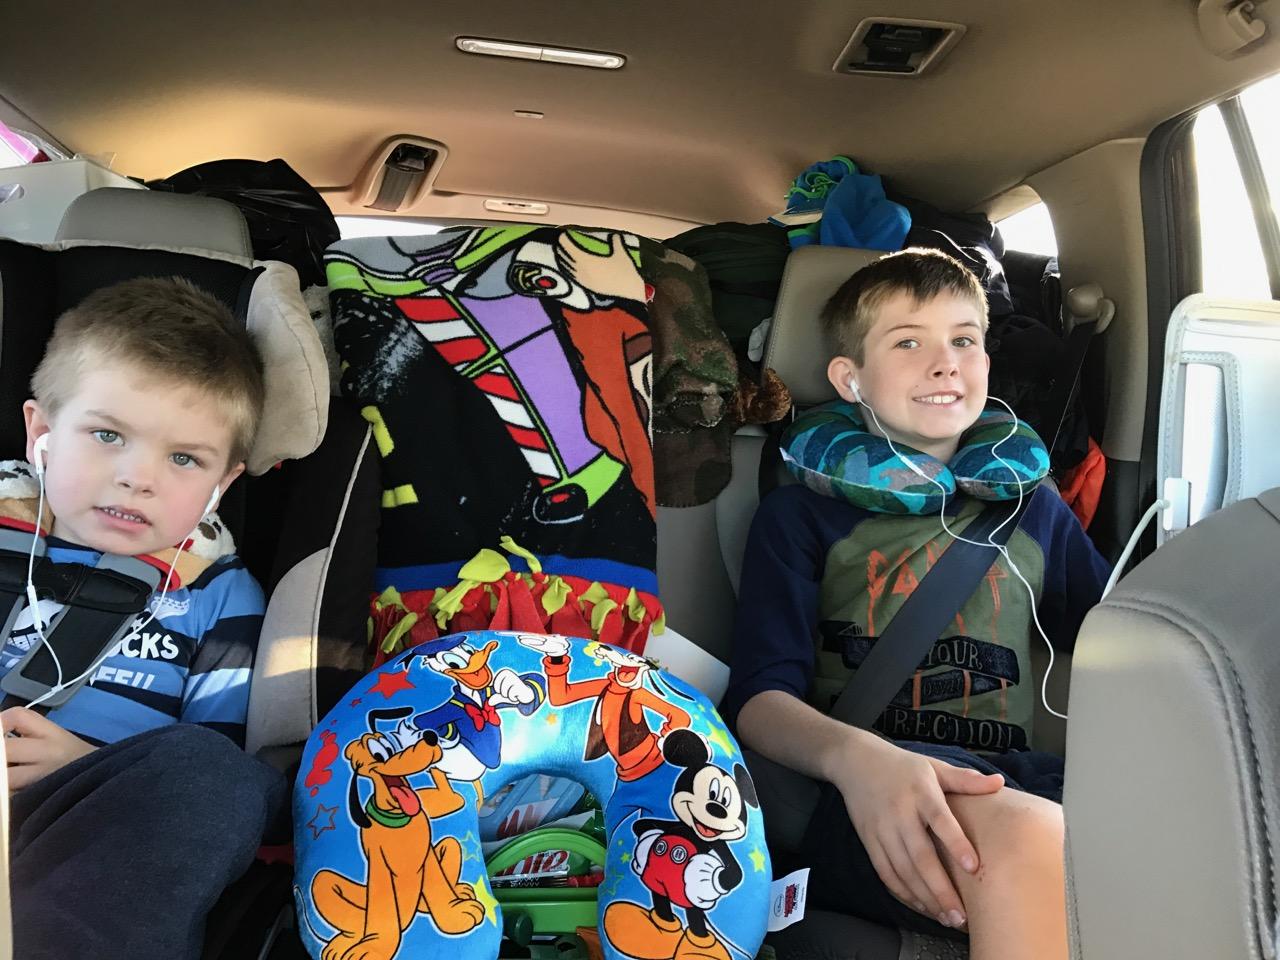 Boys Prepared For Road Trip